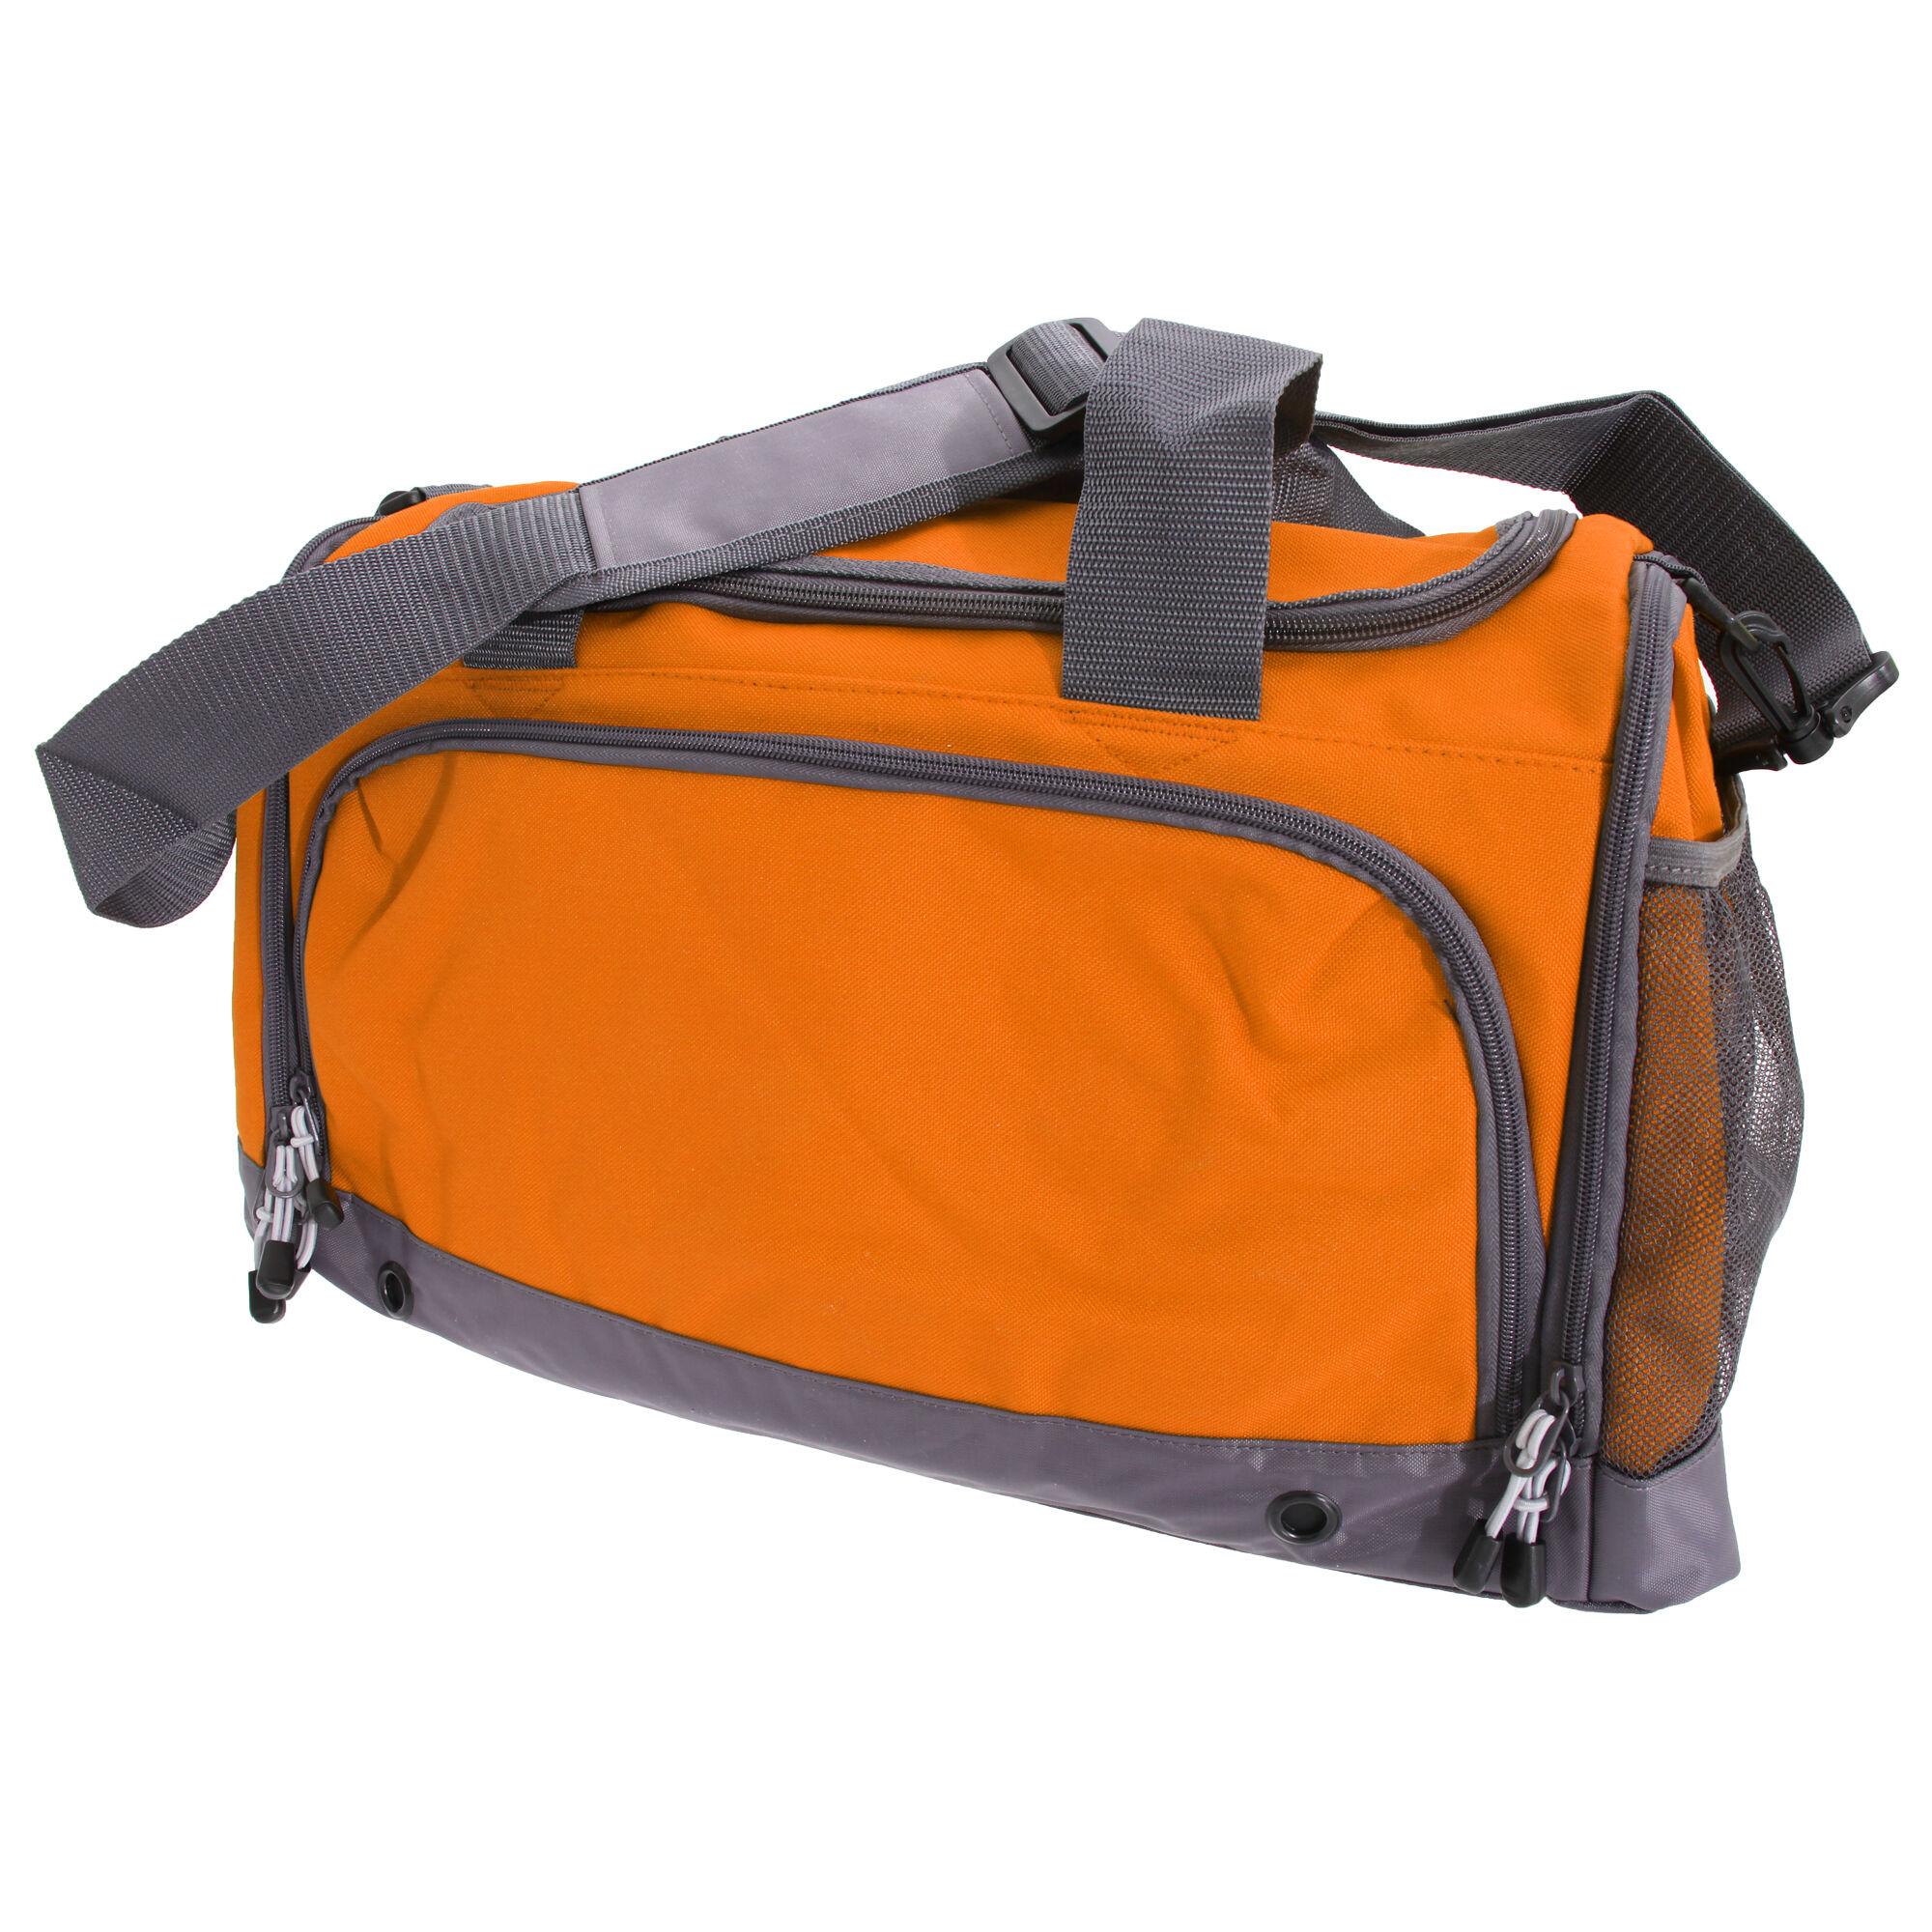 Bagbase - Sac De Sport (30 Litres) (Orange) - UTRW2593